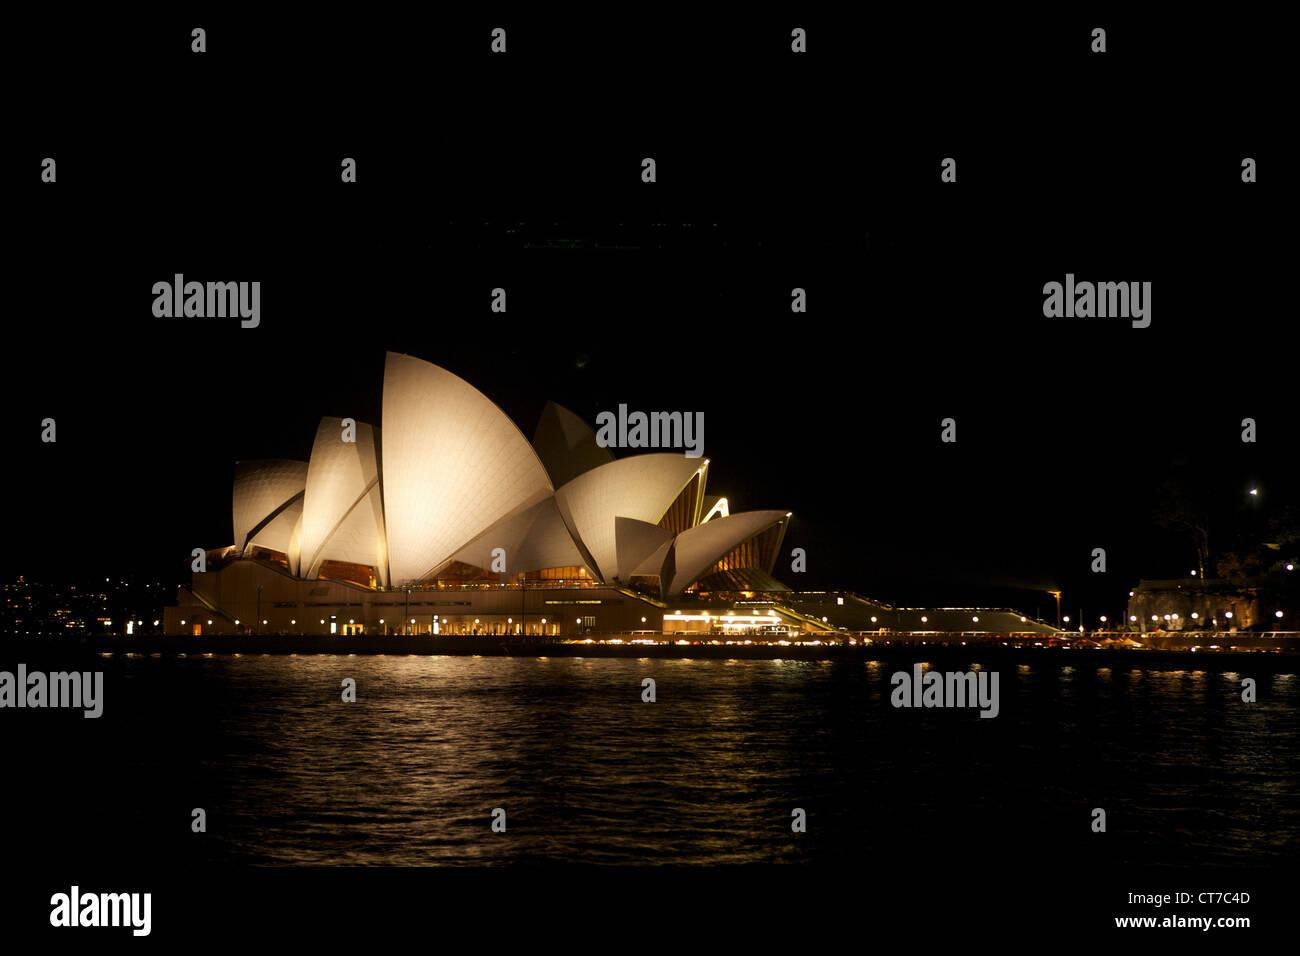 L'Opéra de Sydney, Sydney, Australie Photo Stock